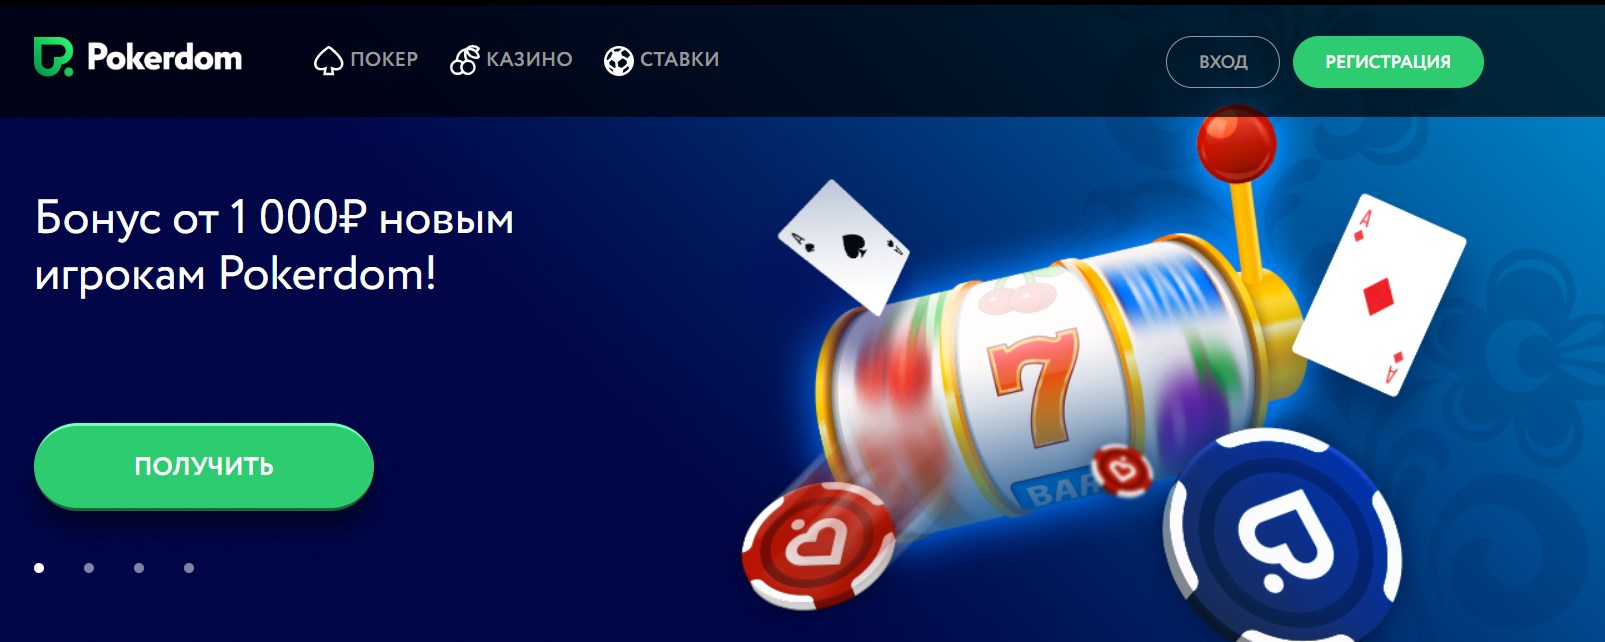 Pokerdom - Официальный сайт